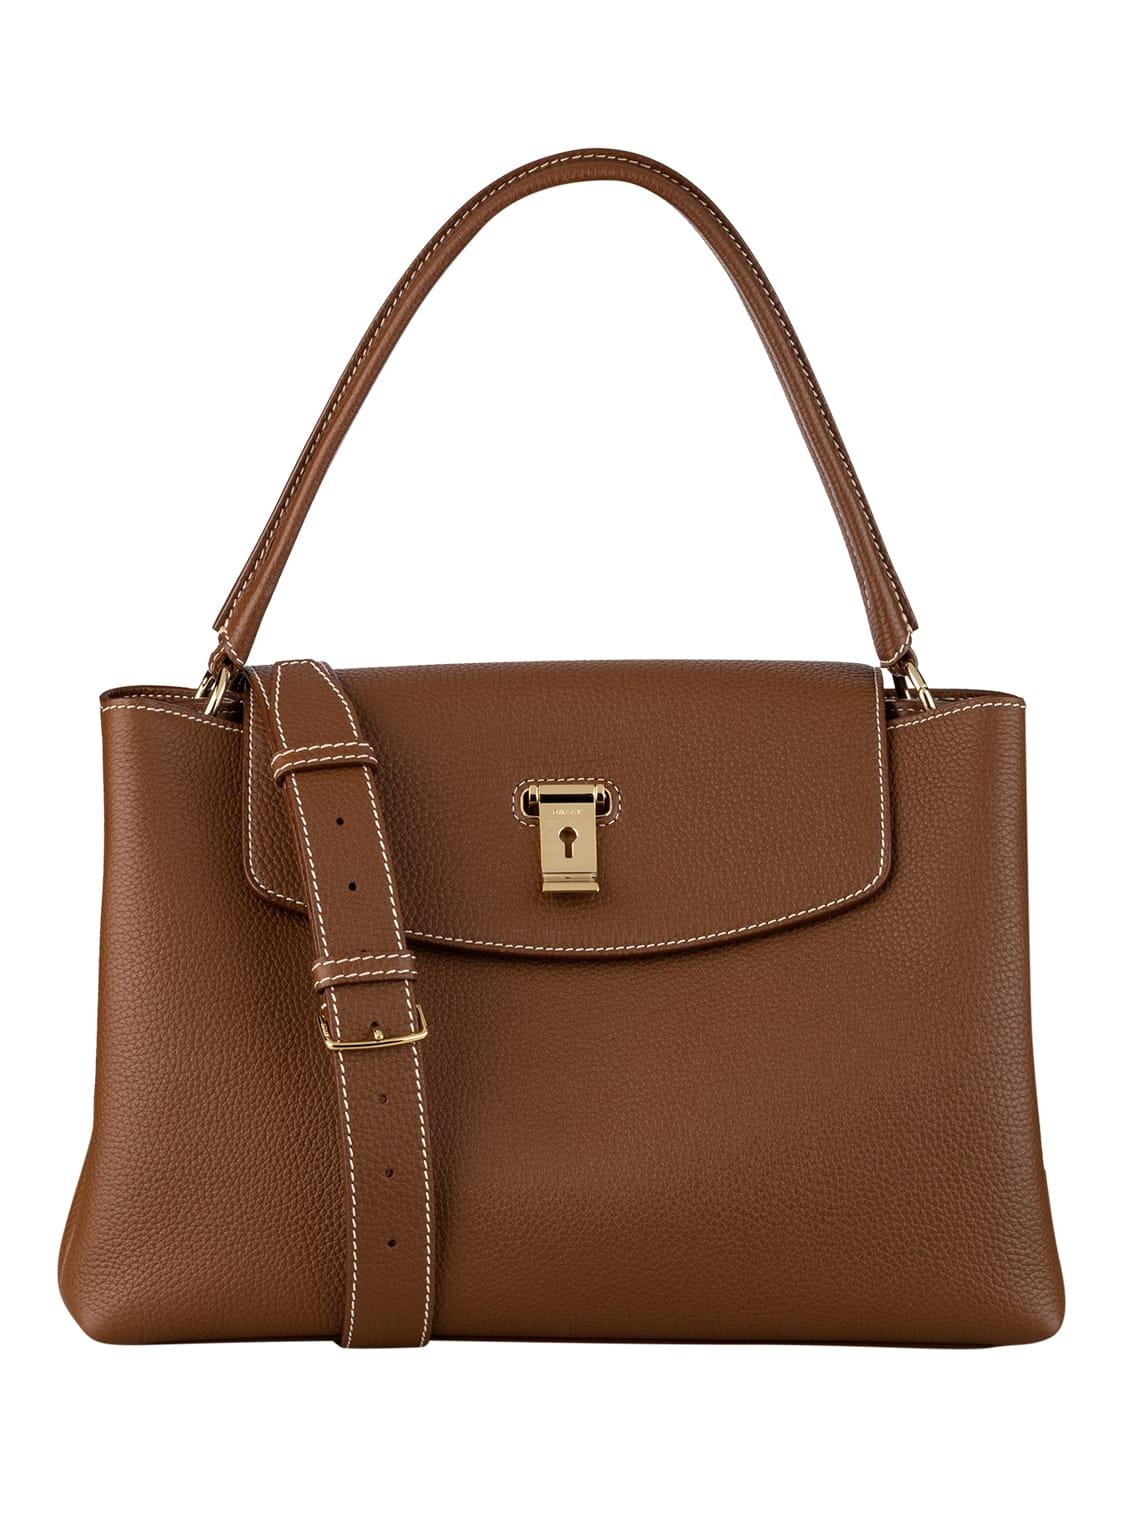 Image of Bally Handtasche Layka braun